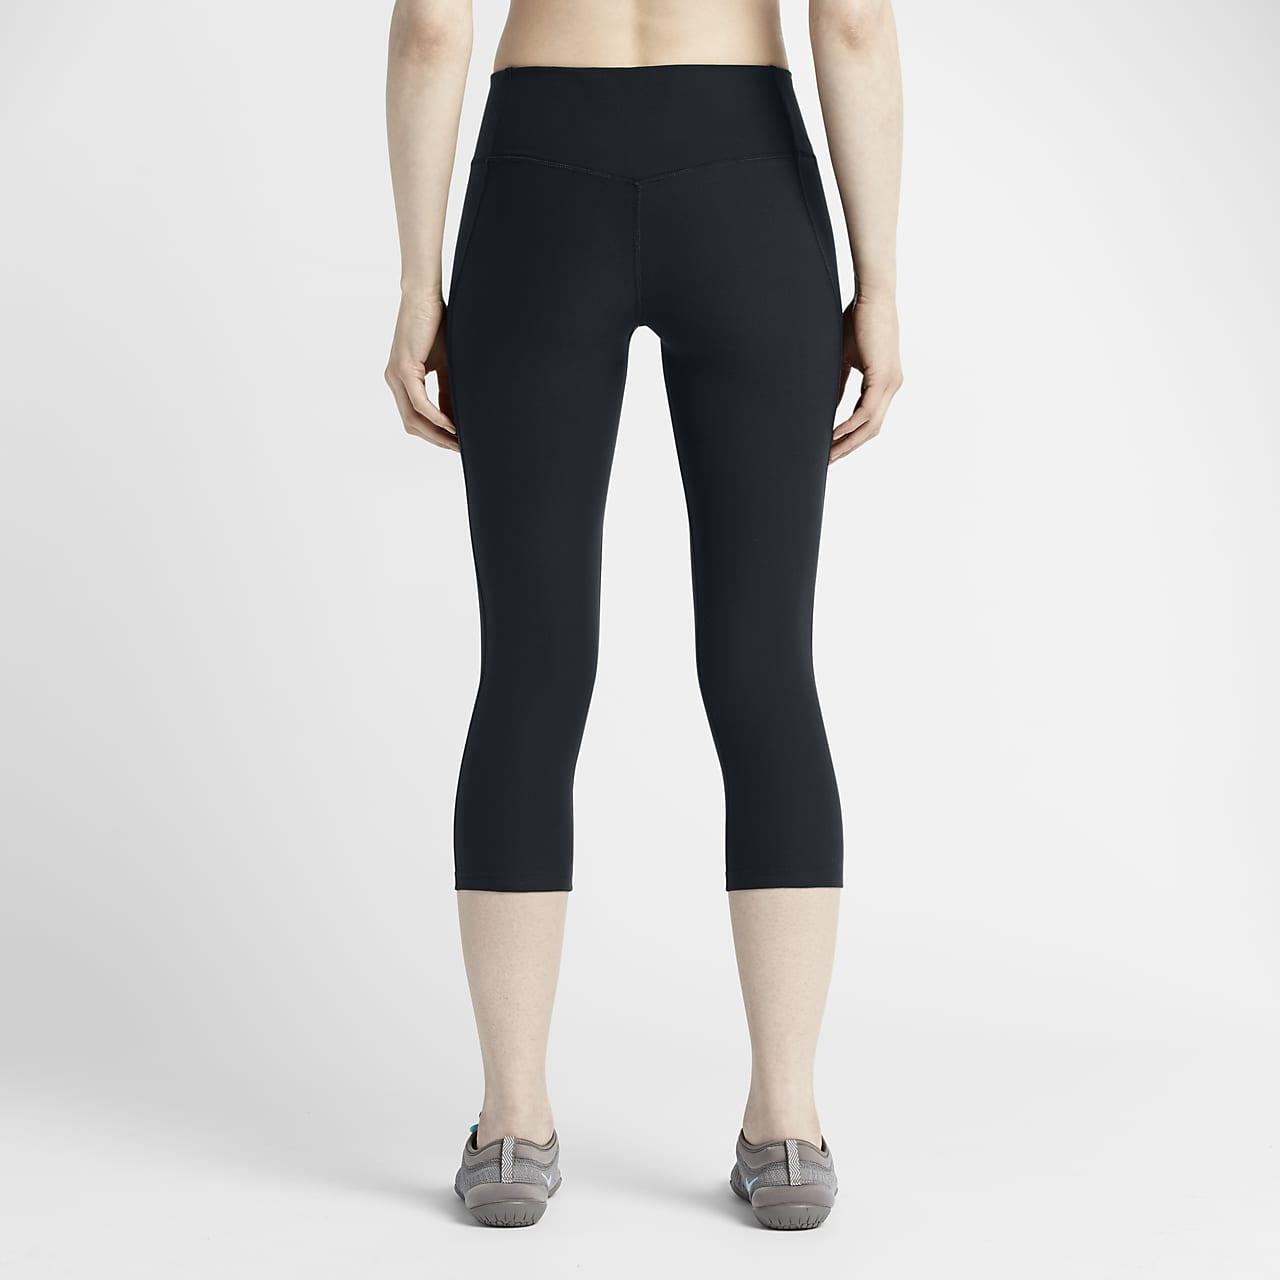 Subordinar Betsy Trotwood Arrugas  Nike Legend 2.0 Tight Poly Women's Training Capris. Nike BG